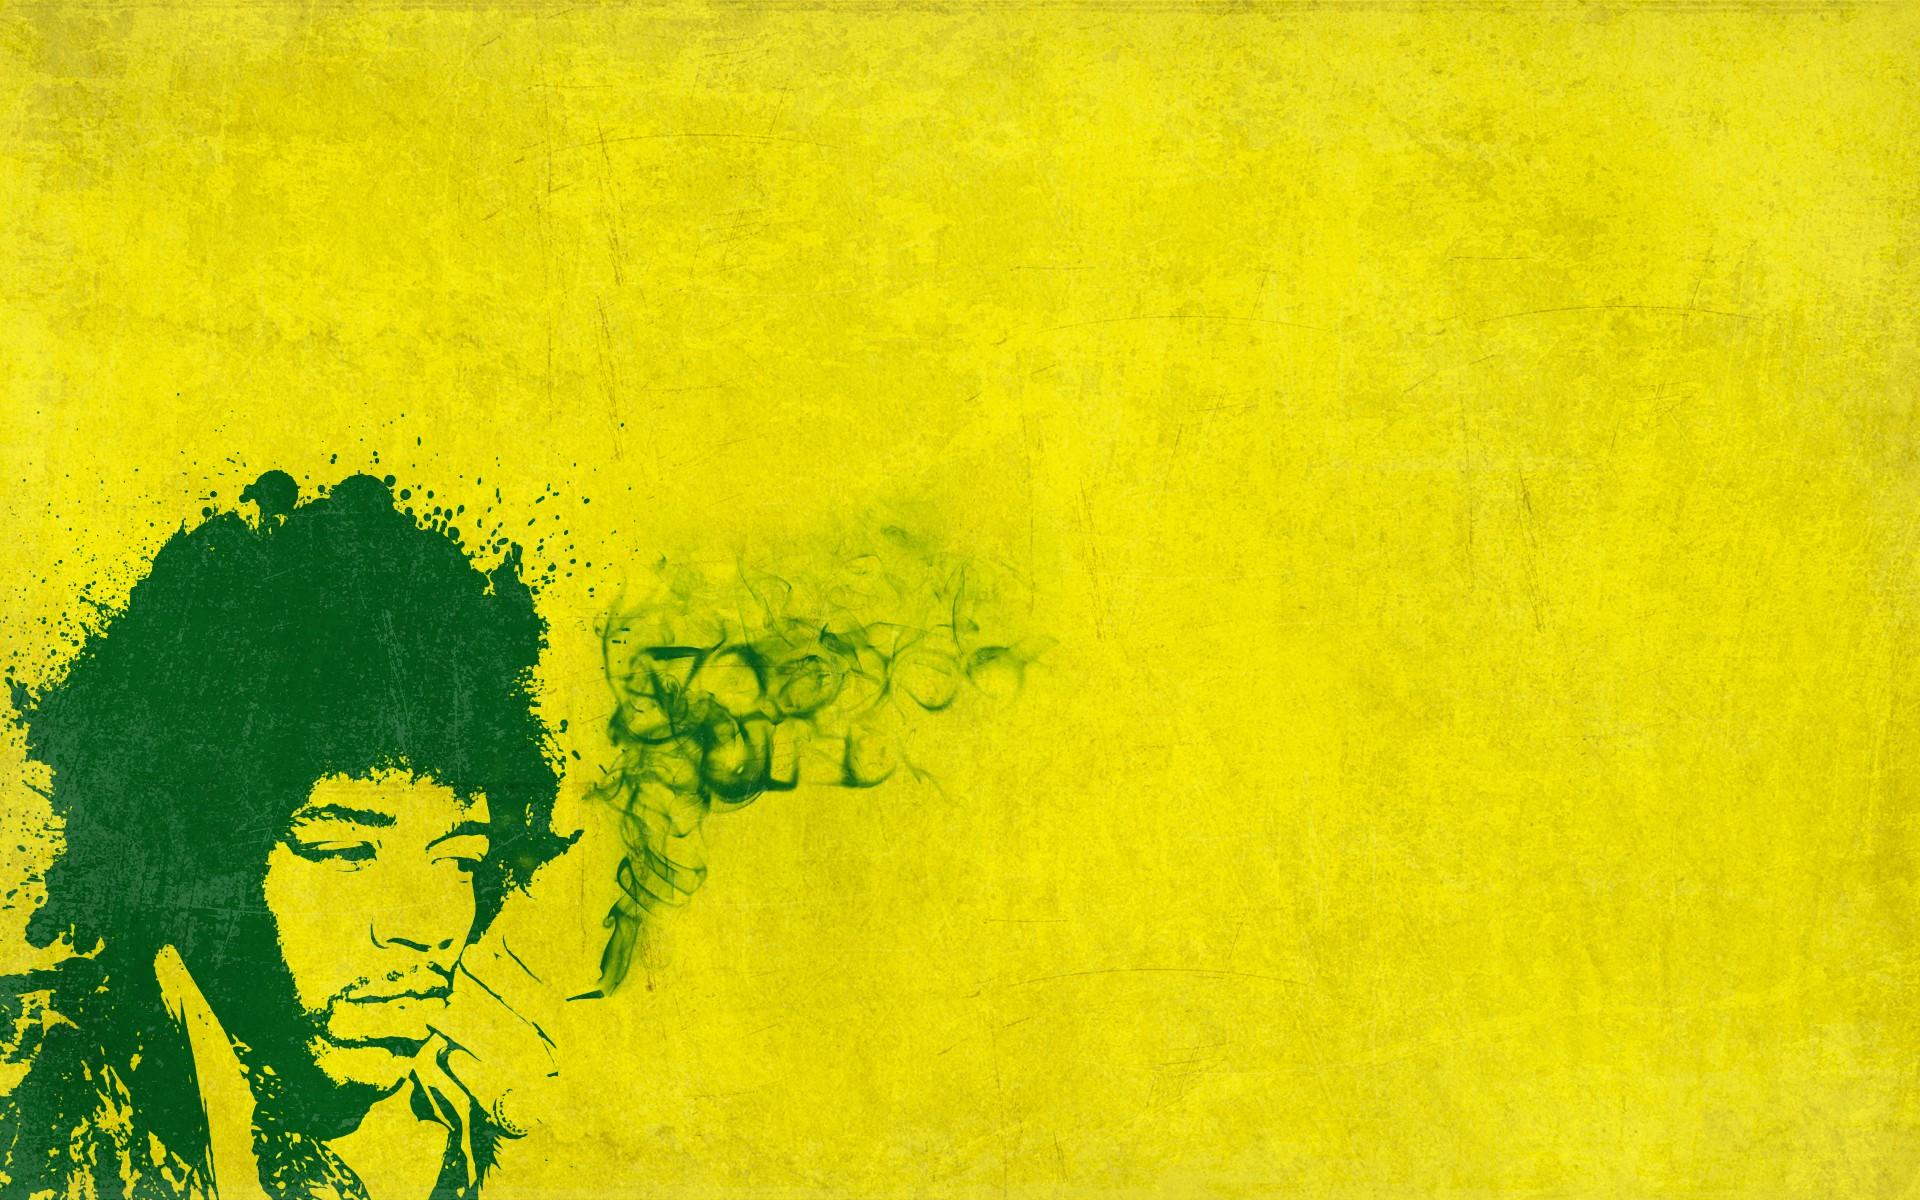 Jimi hendrix full hd wallpaper and background image 1920x1200 id music jimi hendrix wallpaper thecheapjerseys Gallery